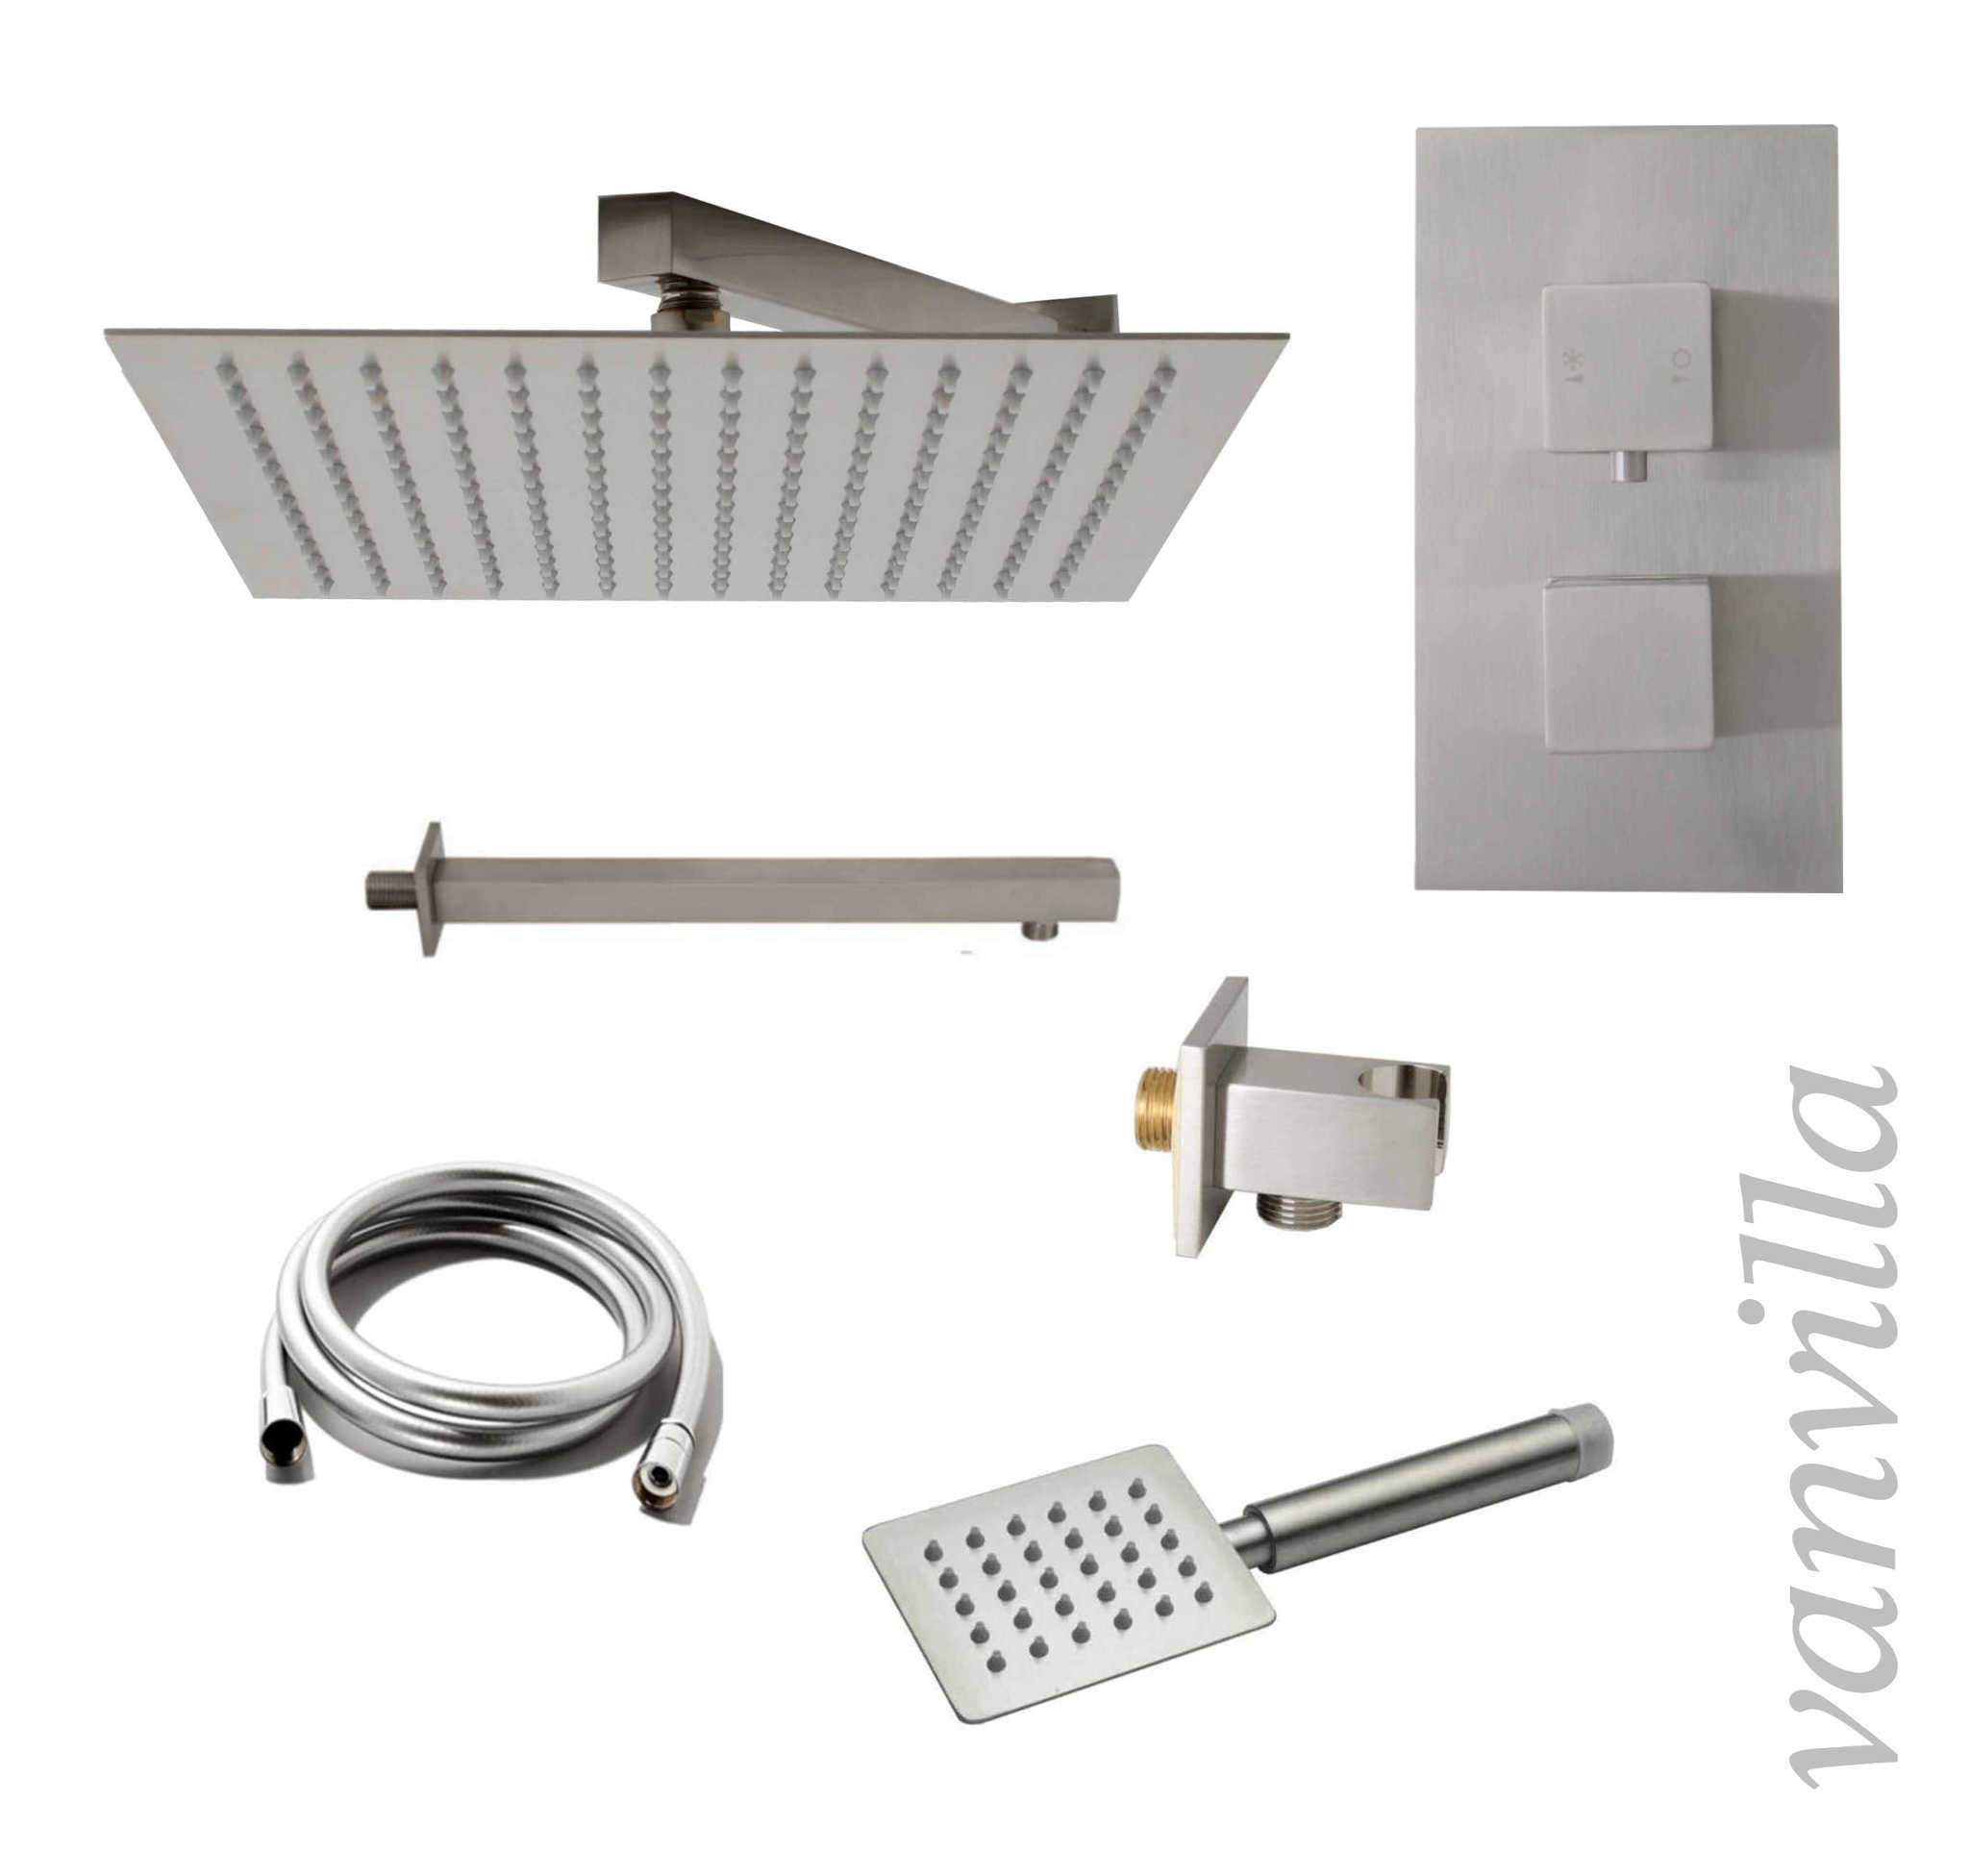 dusch set edelstahl geb rstet duschkopf duscharm 2 wege thermostat regendusche ebay. Black Bedroom Furniture Sets. Home Design Ideas